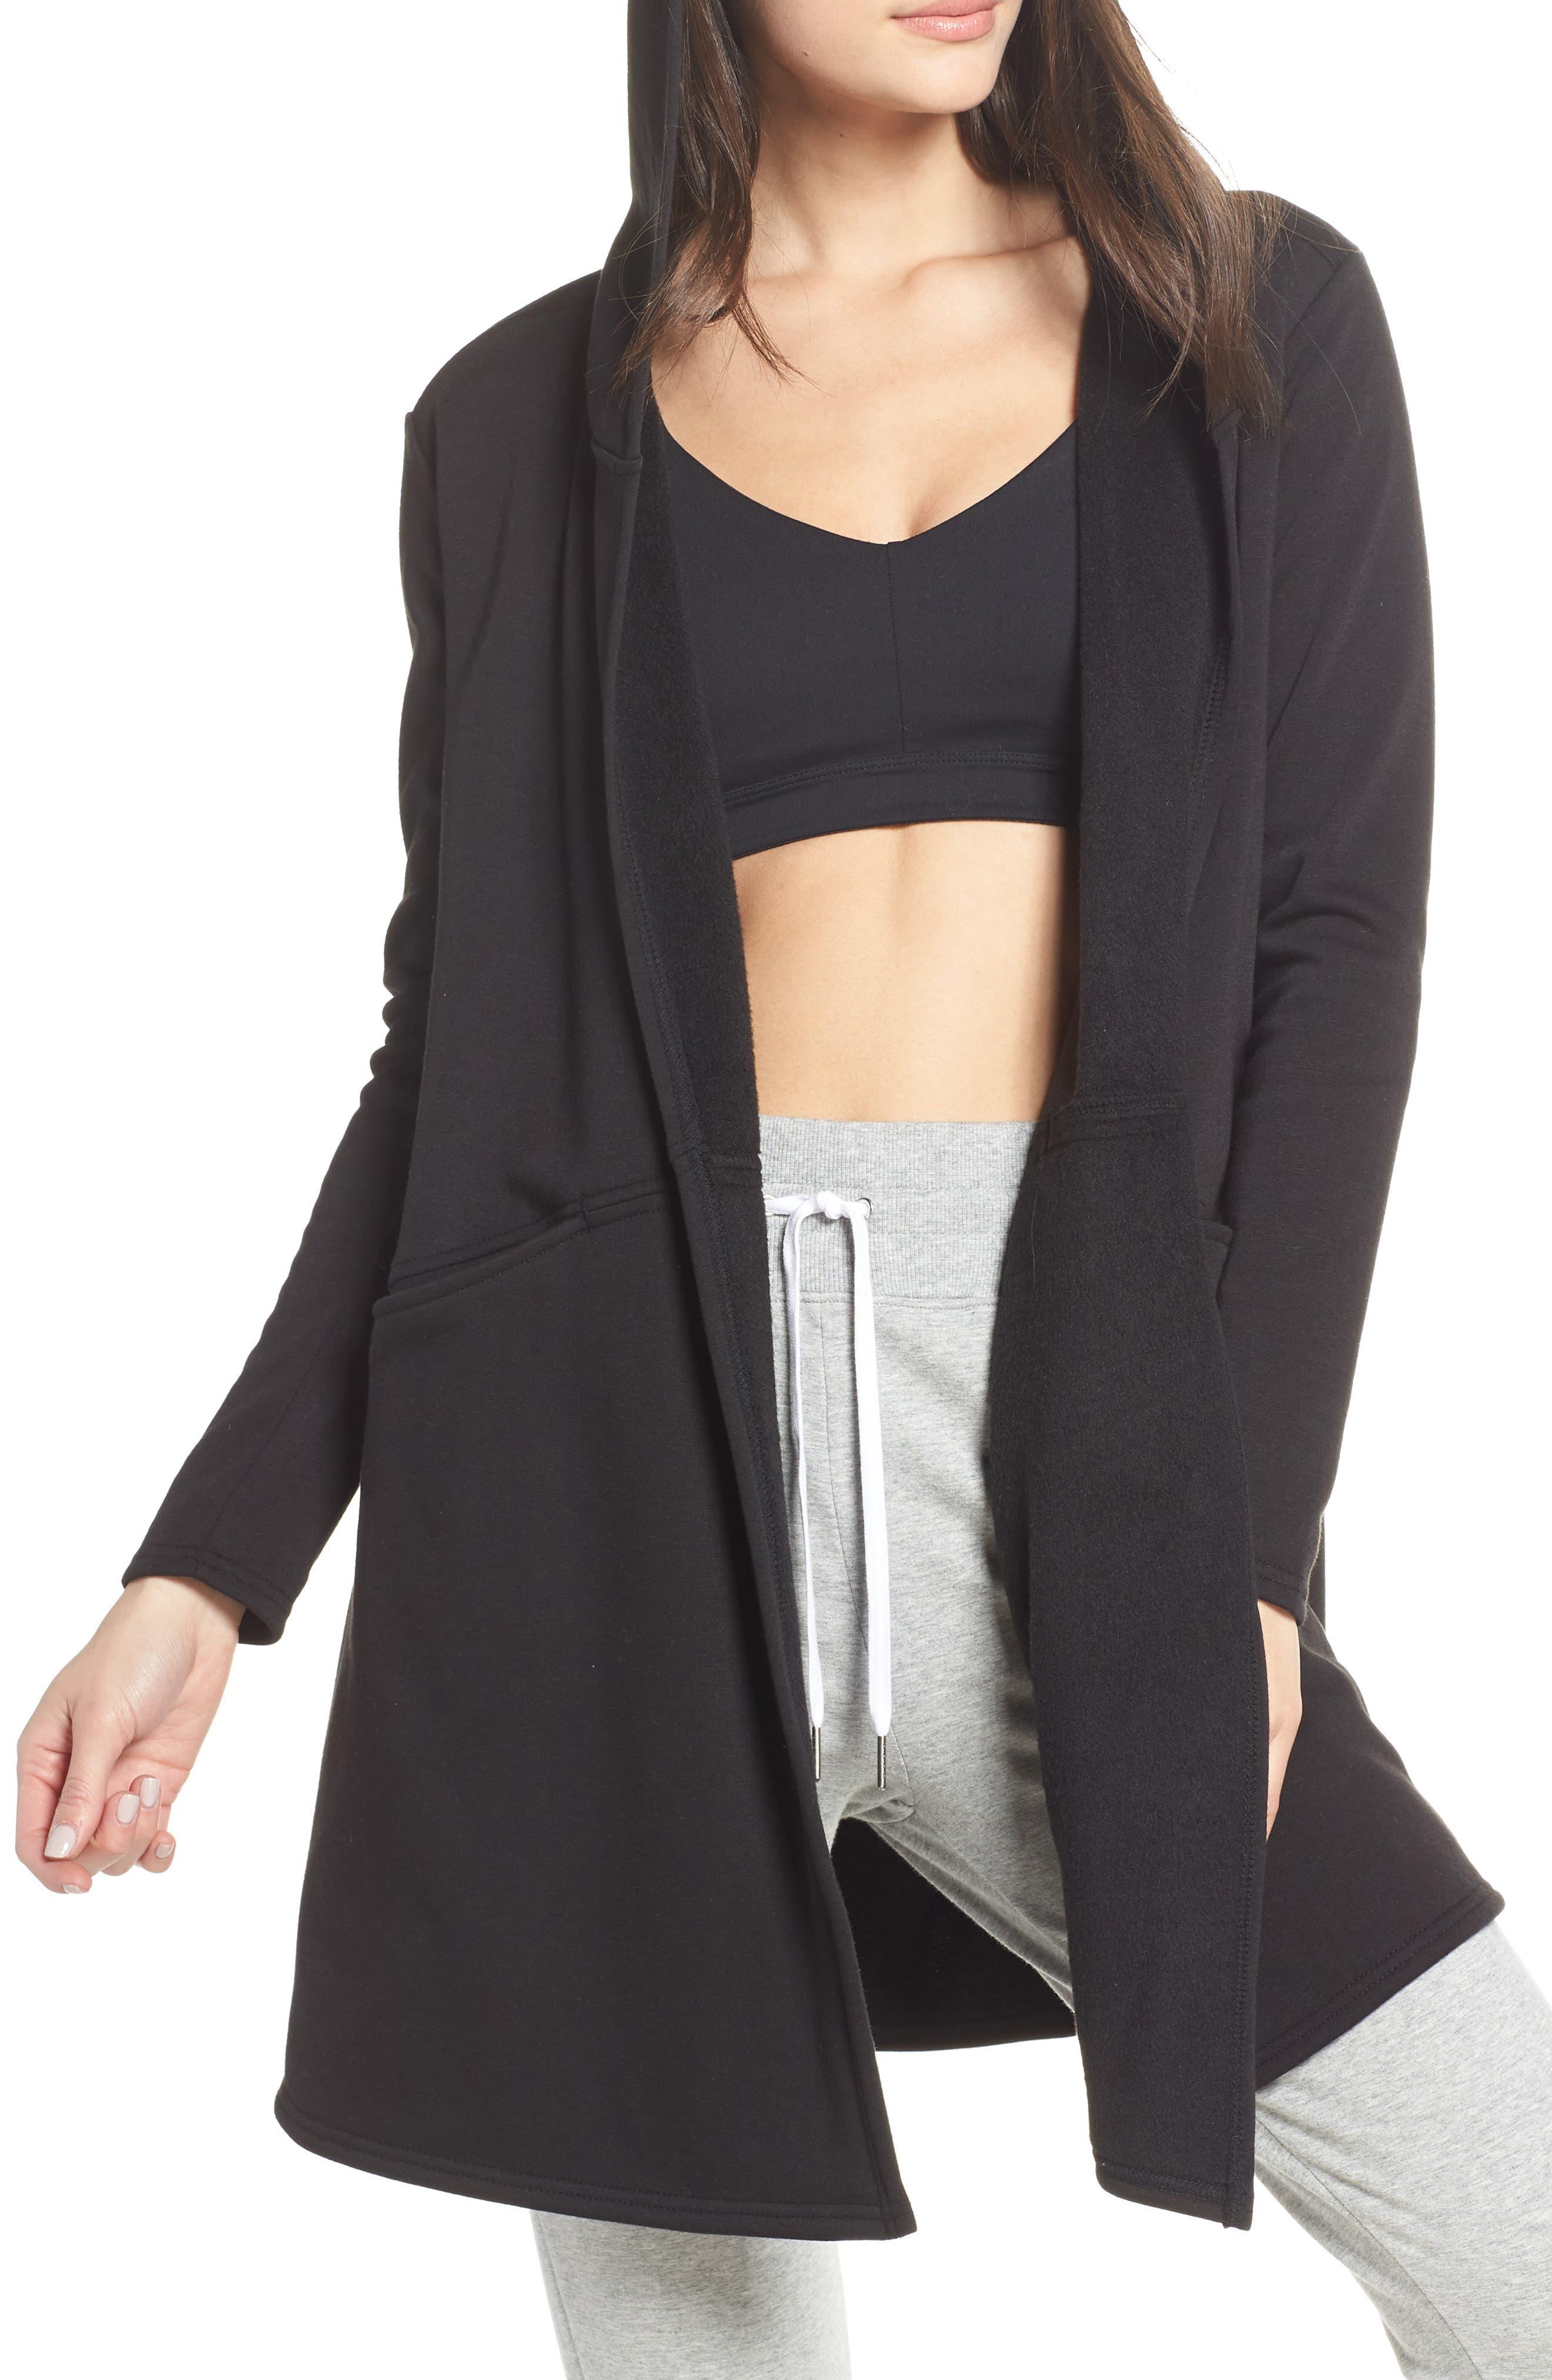 ZELLA Plush Lined Wrap Hooded Jacket, Main, color, 001